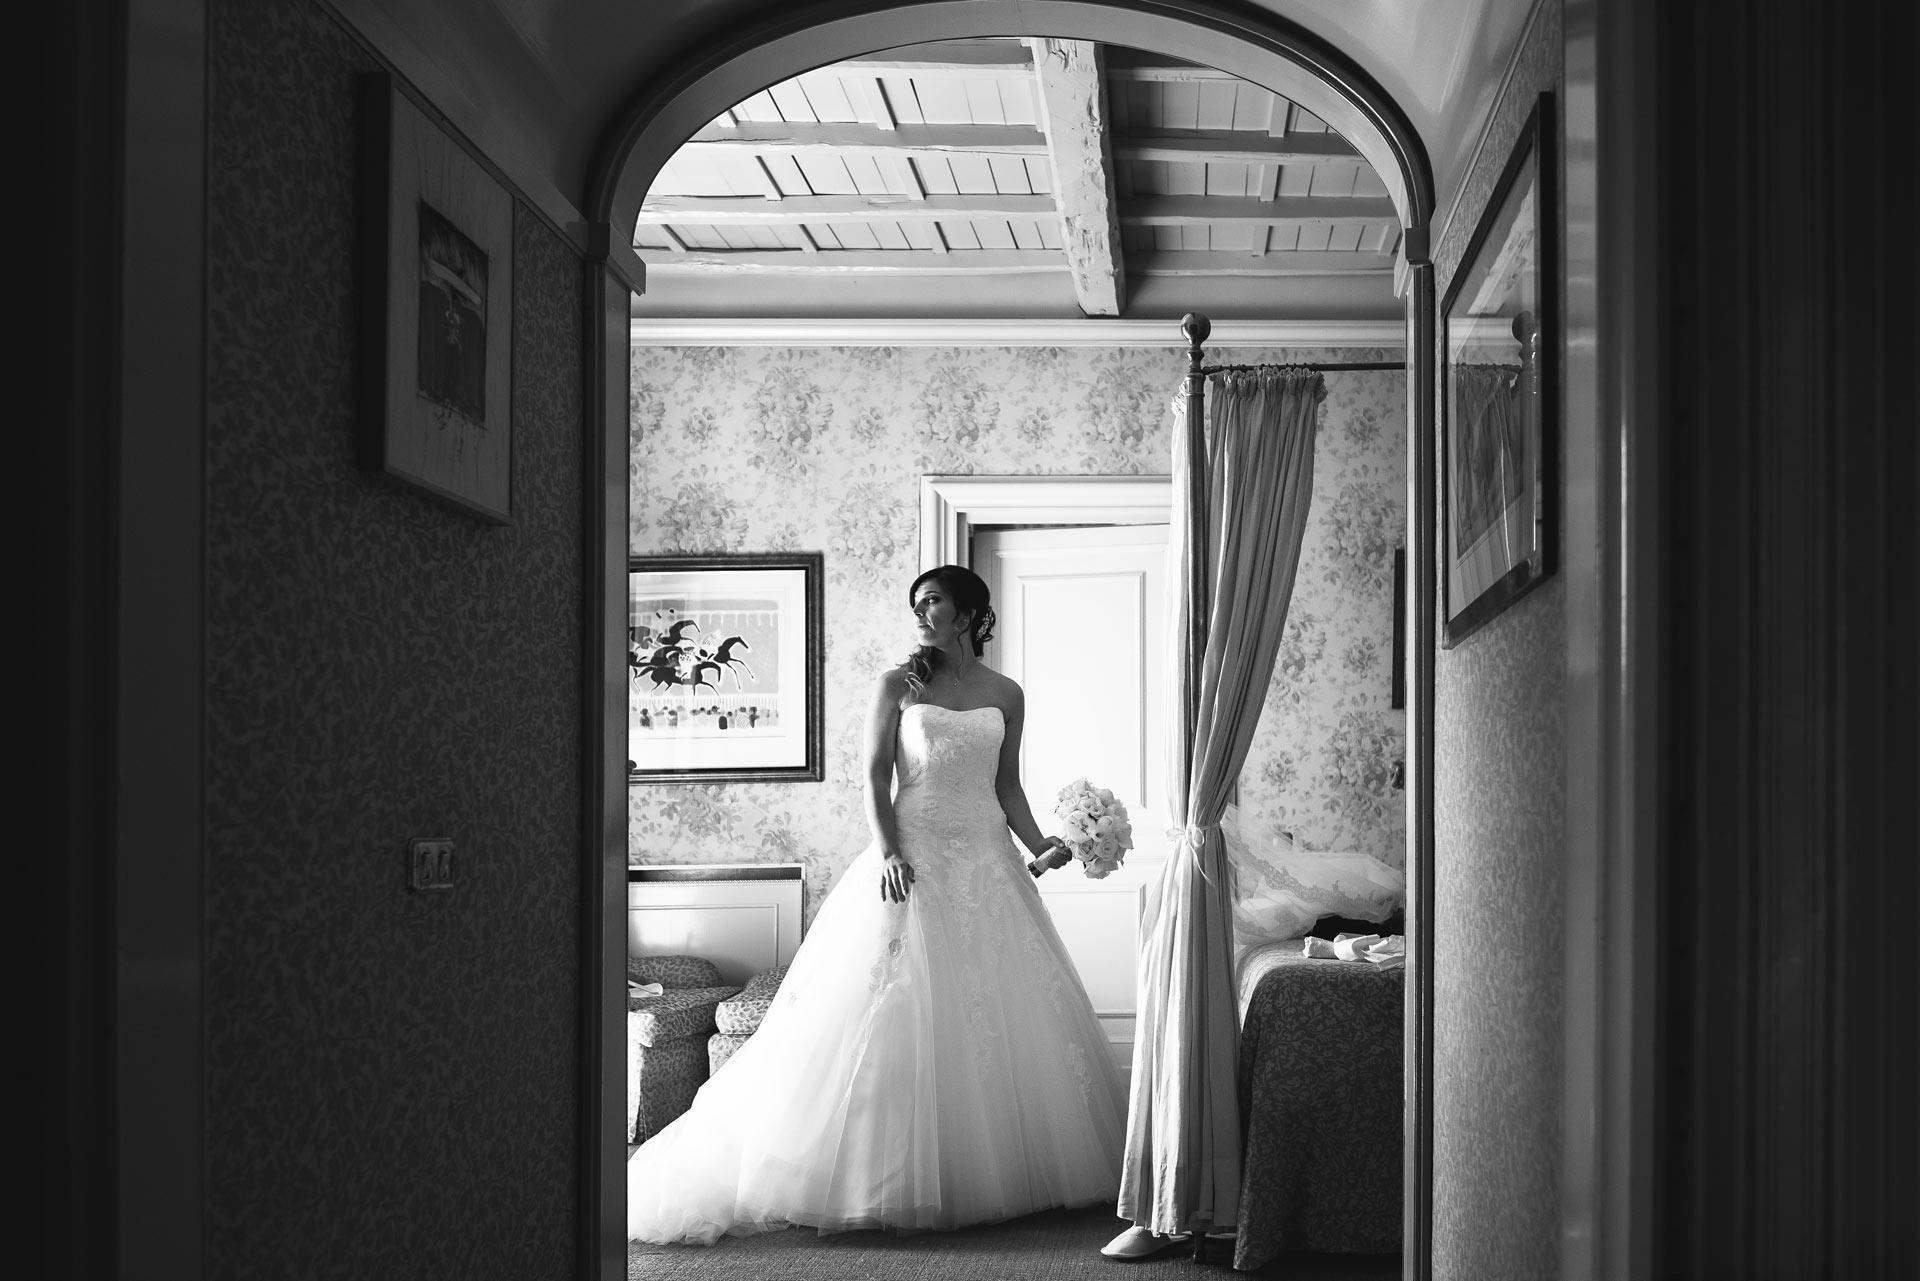 foto-preparativi-sposa-matrimonio-roma-30